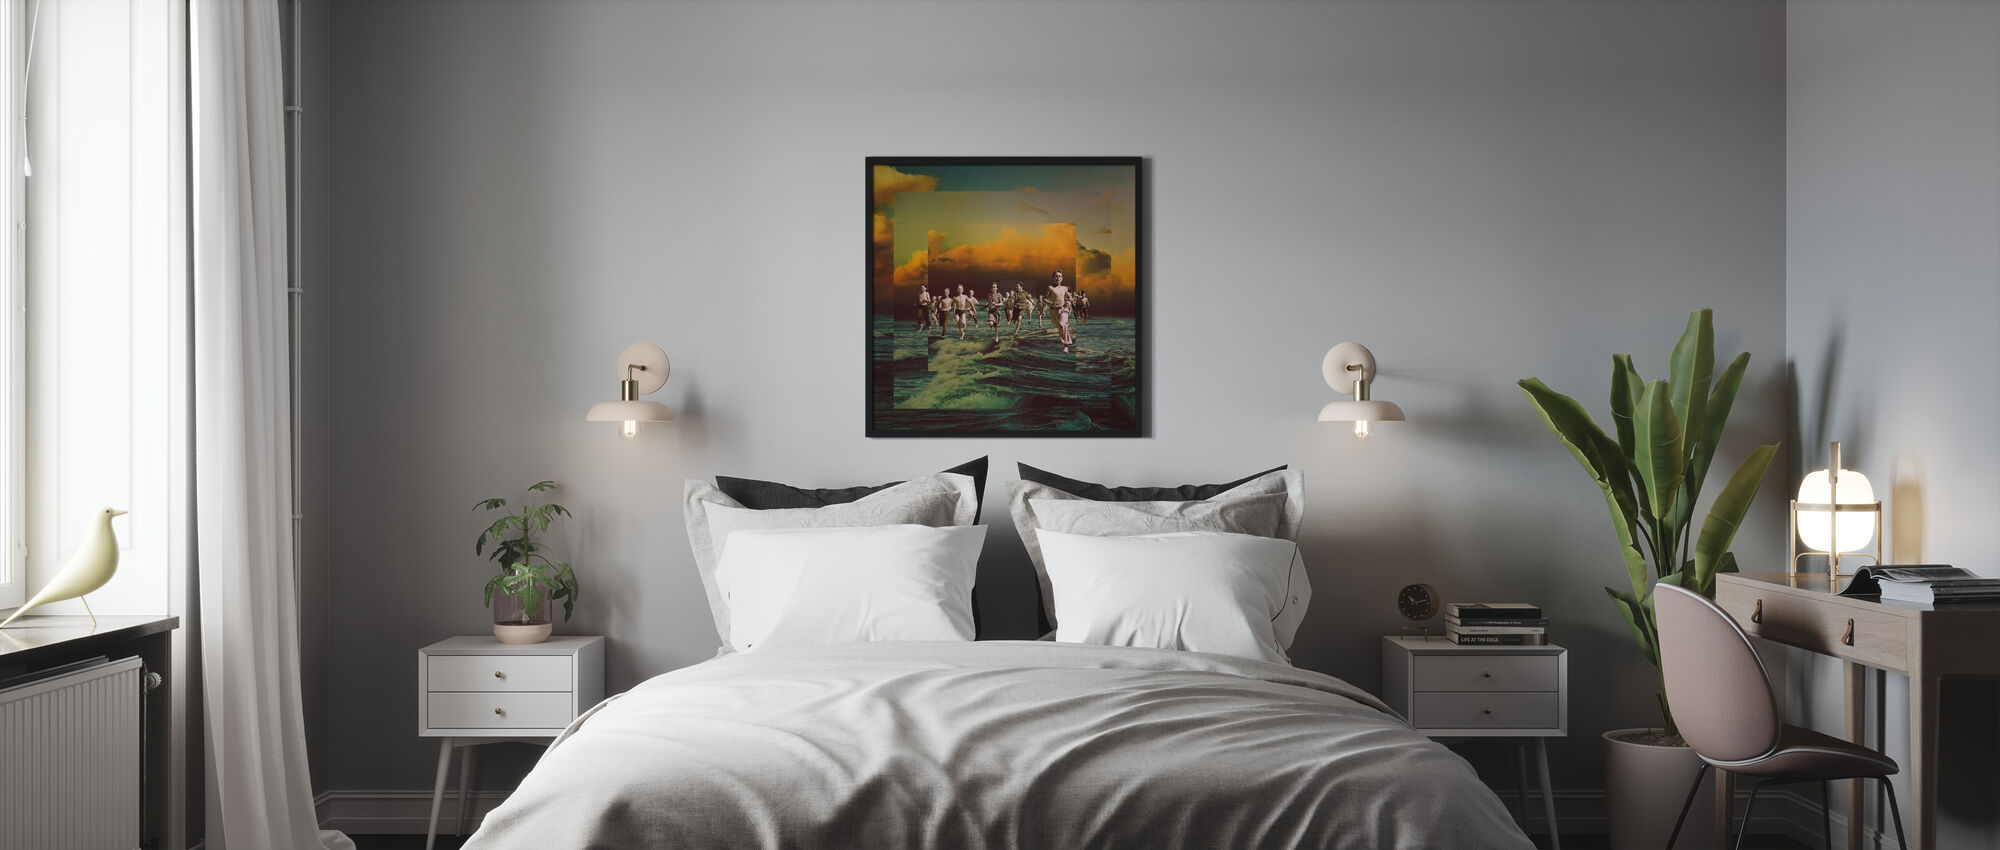 Runaway - Framed print - Bedroom